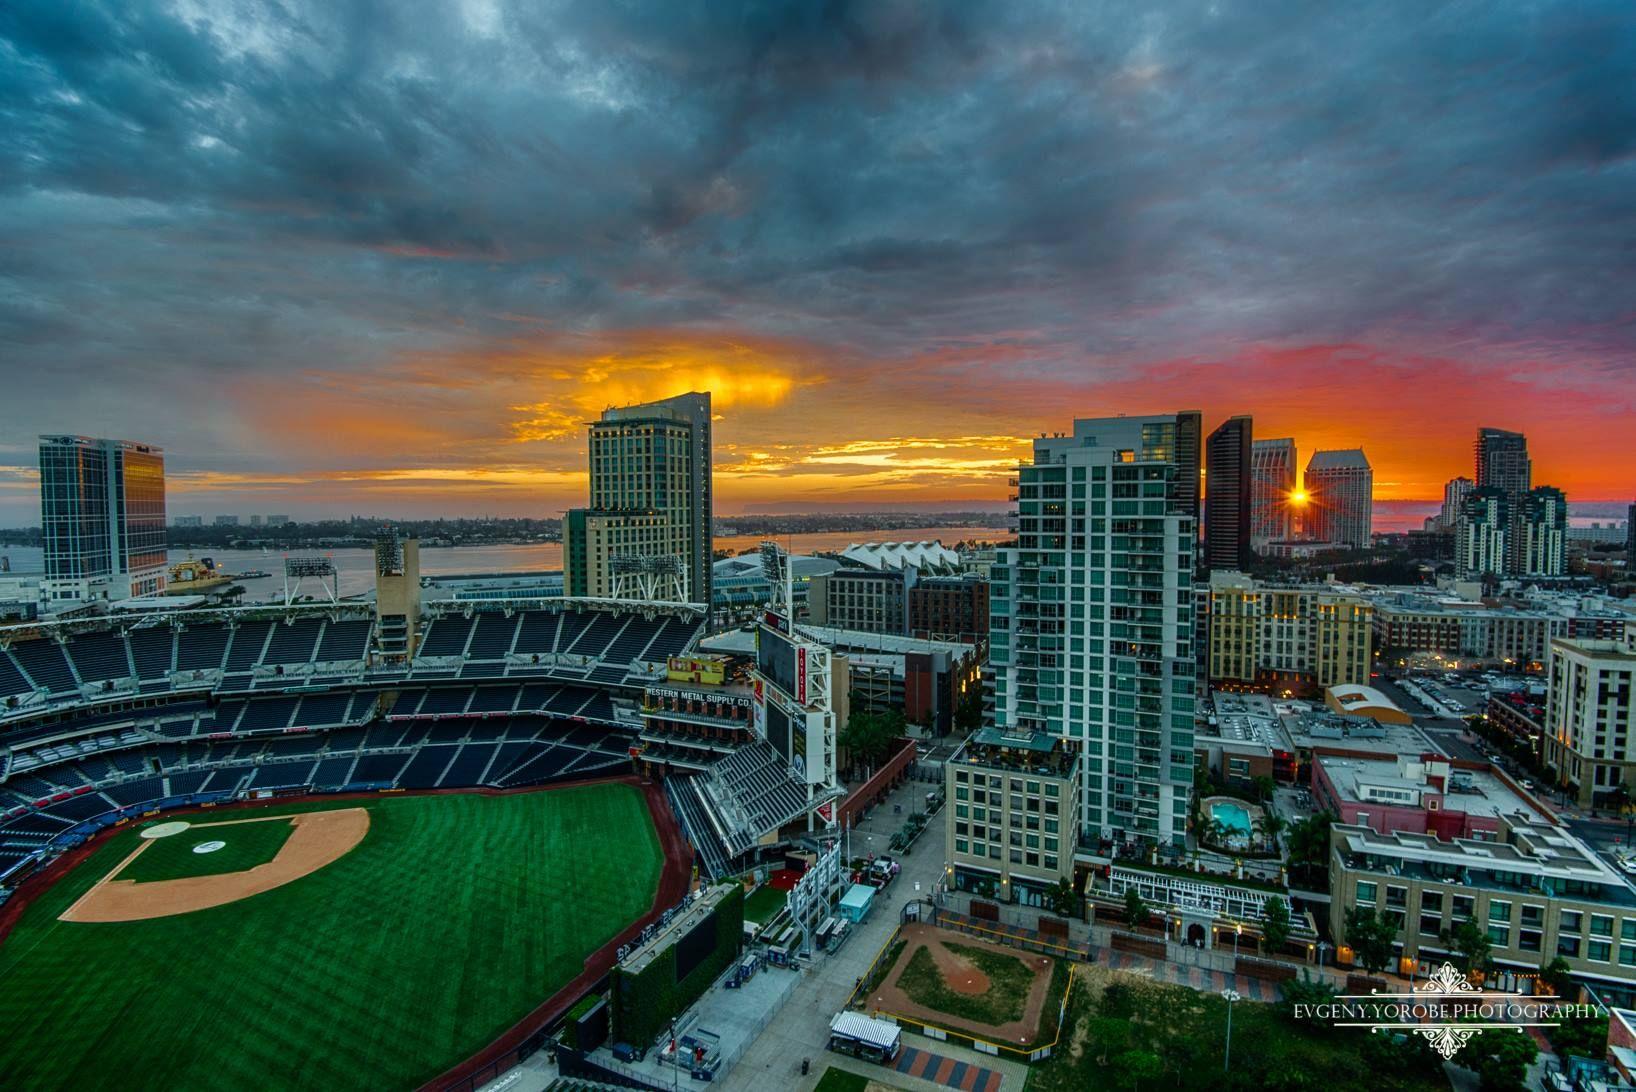 Timeline Photos Evgeny Yorobe Photography Facebook Amazing Sunsets San Diego Petco Park